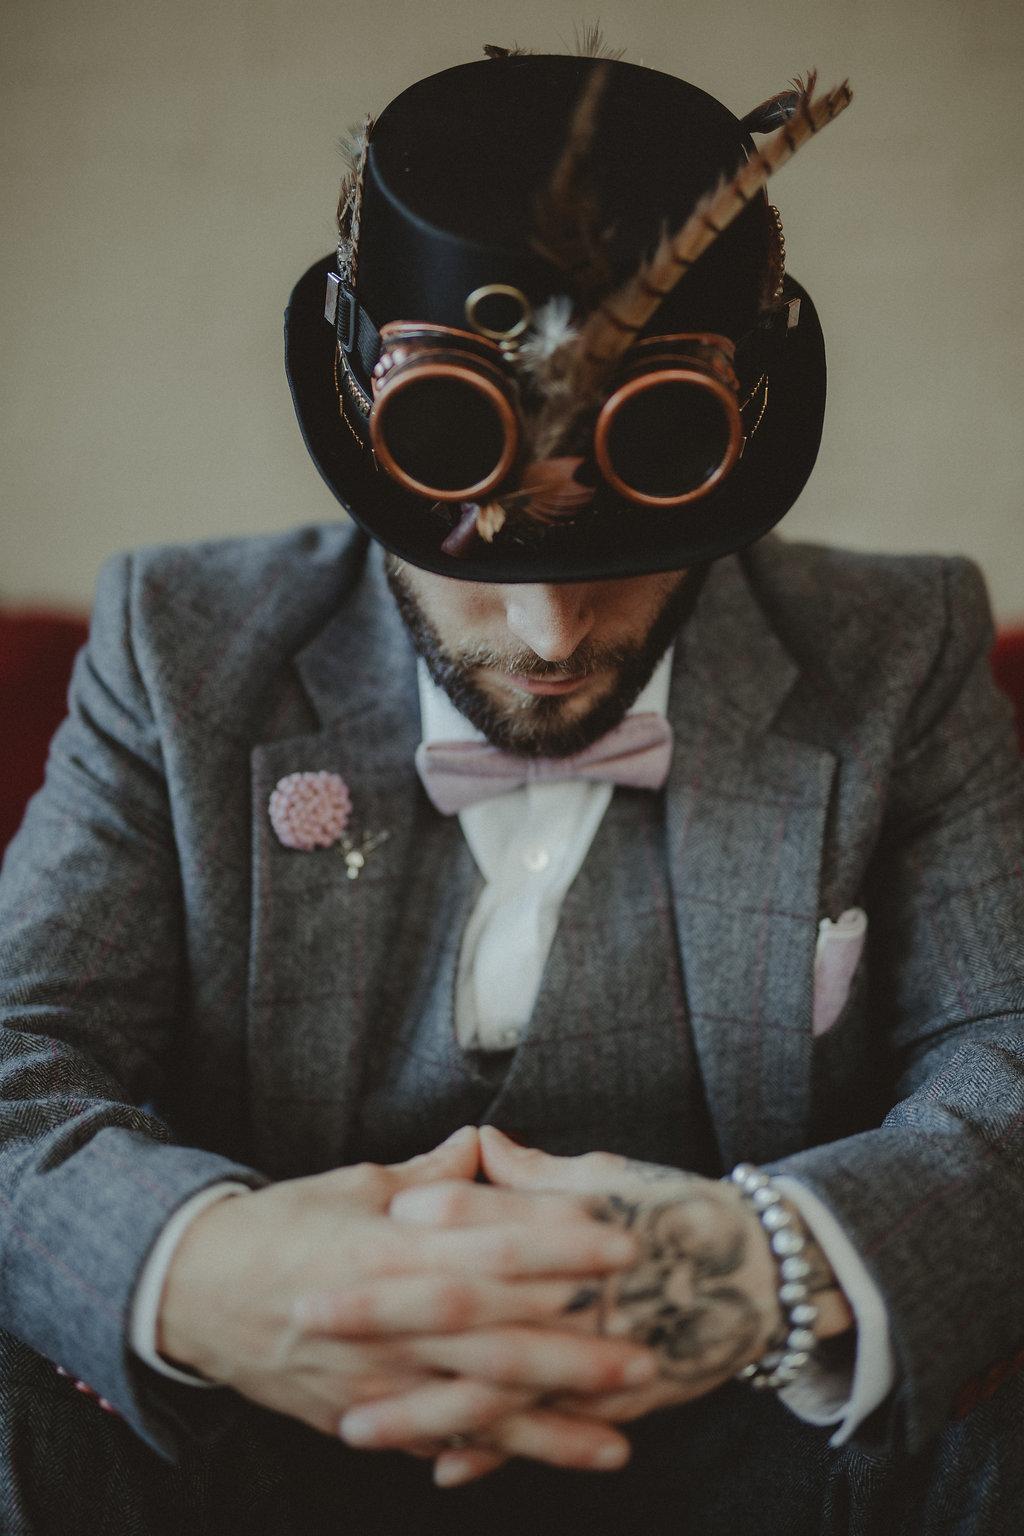 Studio Fotografico Bacci - Steampunk wedding - alternative wedding 70